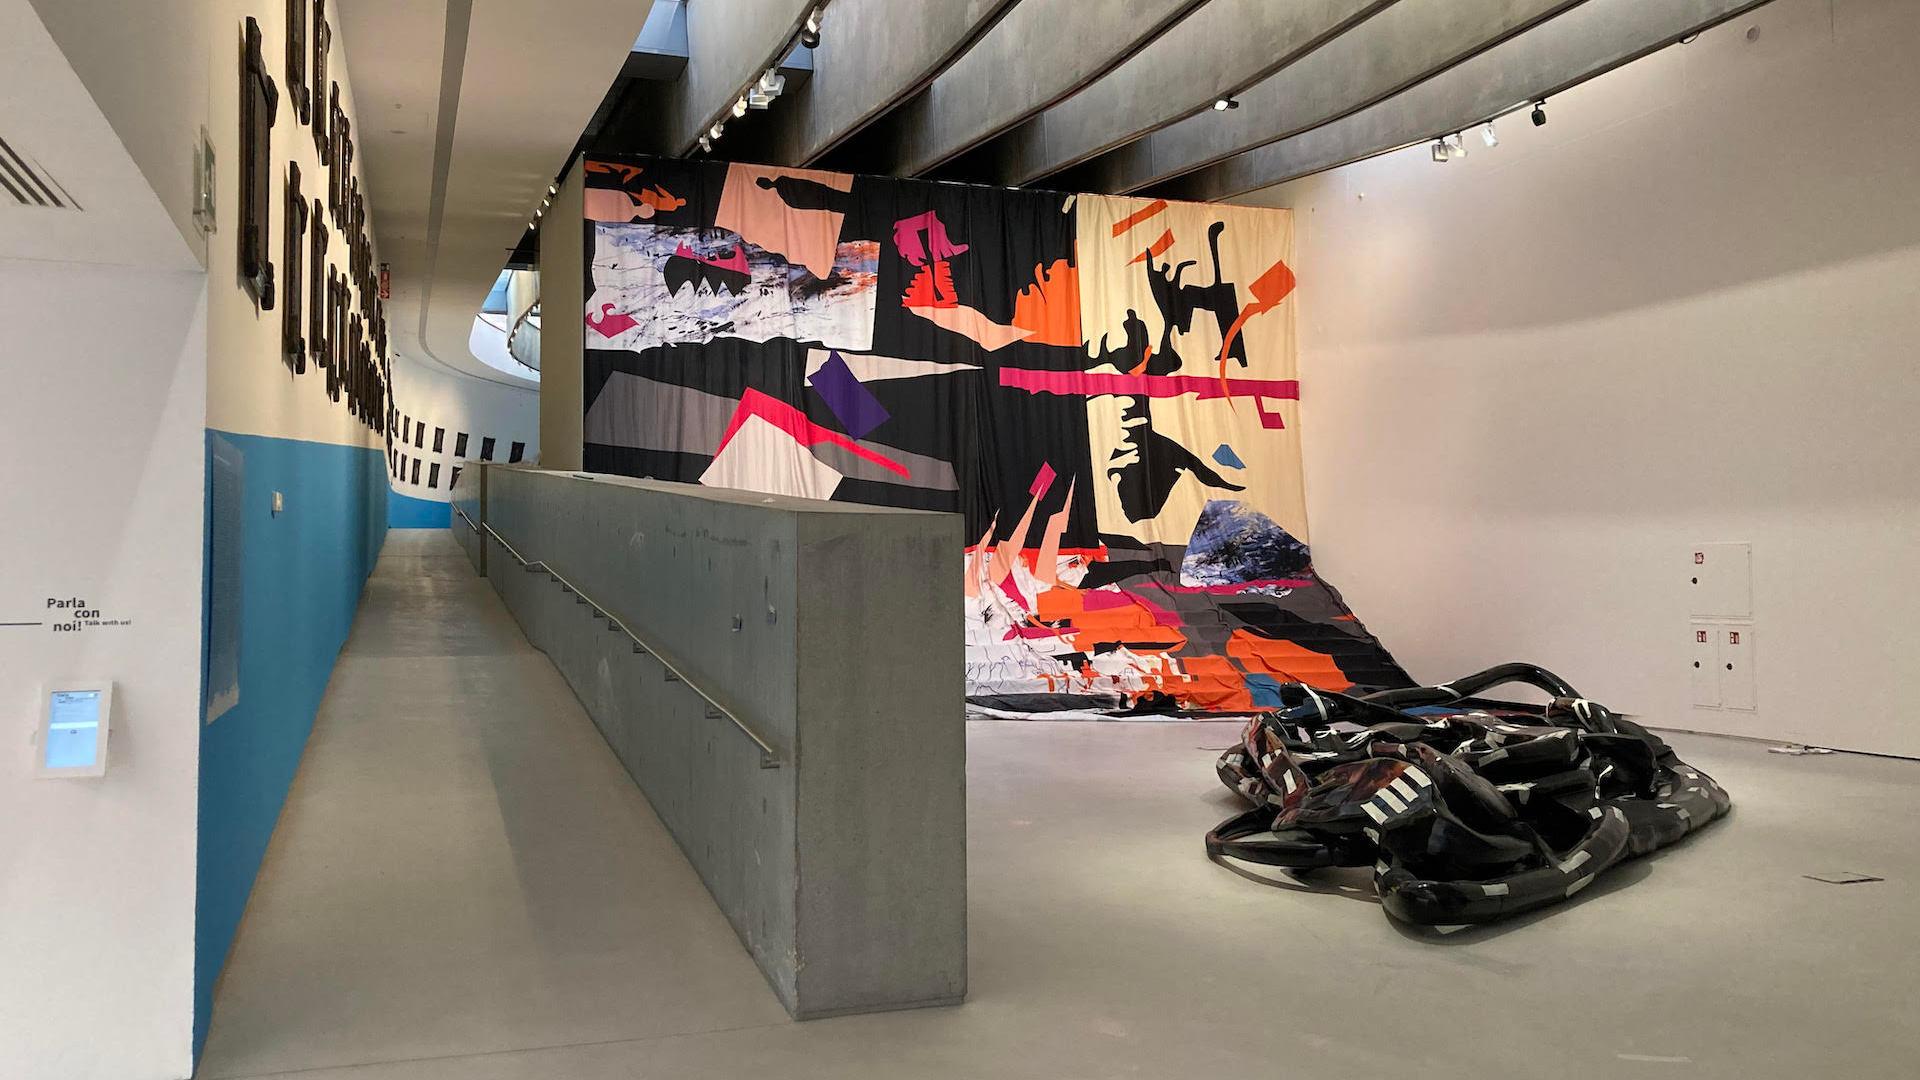 Večeri s WHW Akademijom | Prvi razgovor s kustosicom Zdenkom Badovinac nakon nepotvrđenog mandata direktorice ljubljanske Moderne galerije